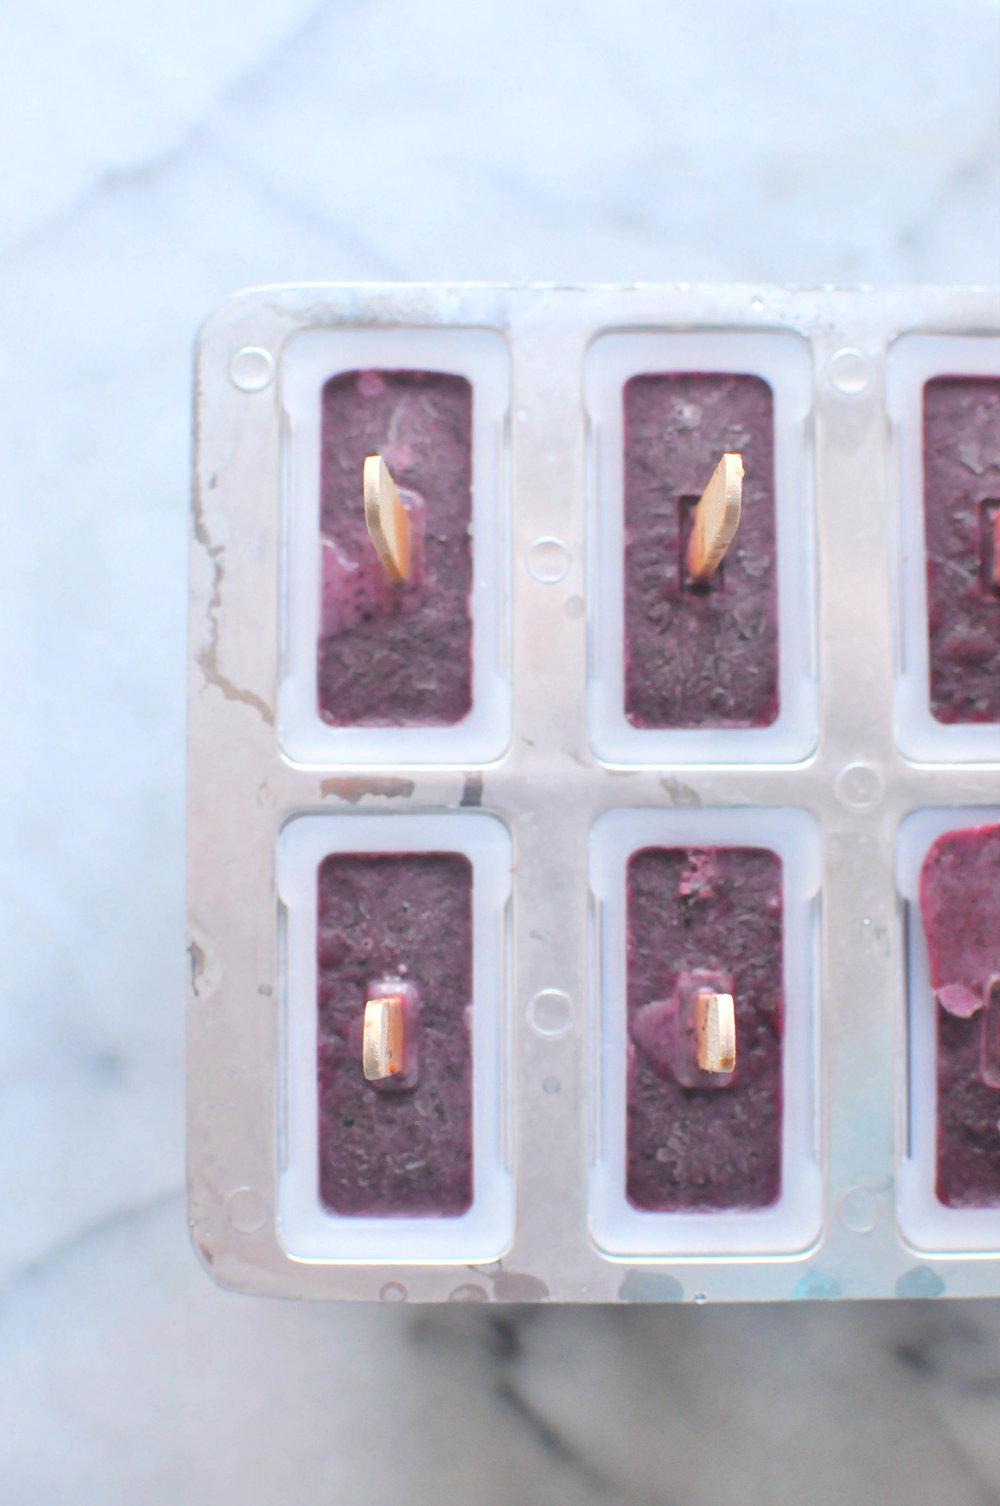 Blueberry Basil Coconut Milk Popsicles. A refreshing dessert | Shiny Happy Bright